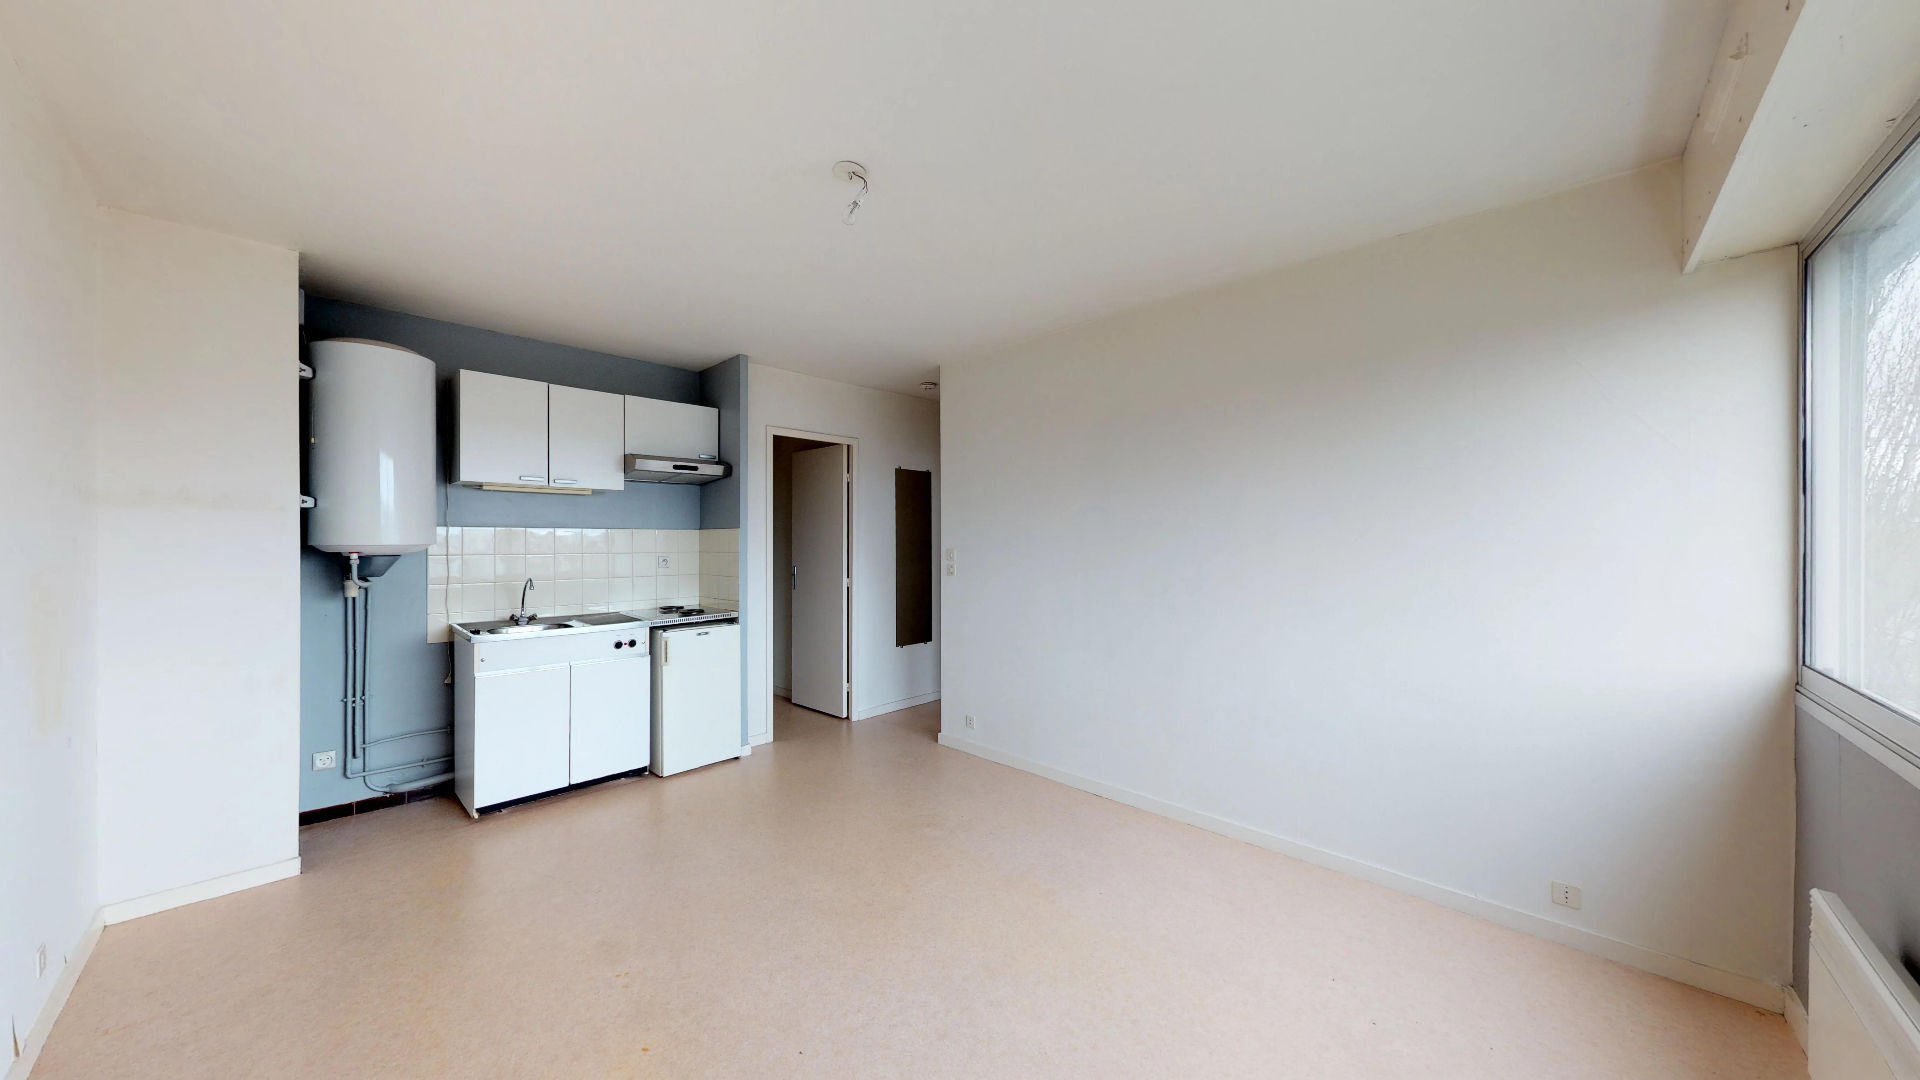 appartement 36m²  BESANÇON  - photo 1